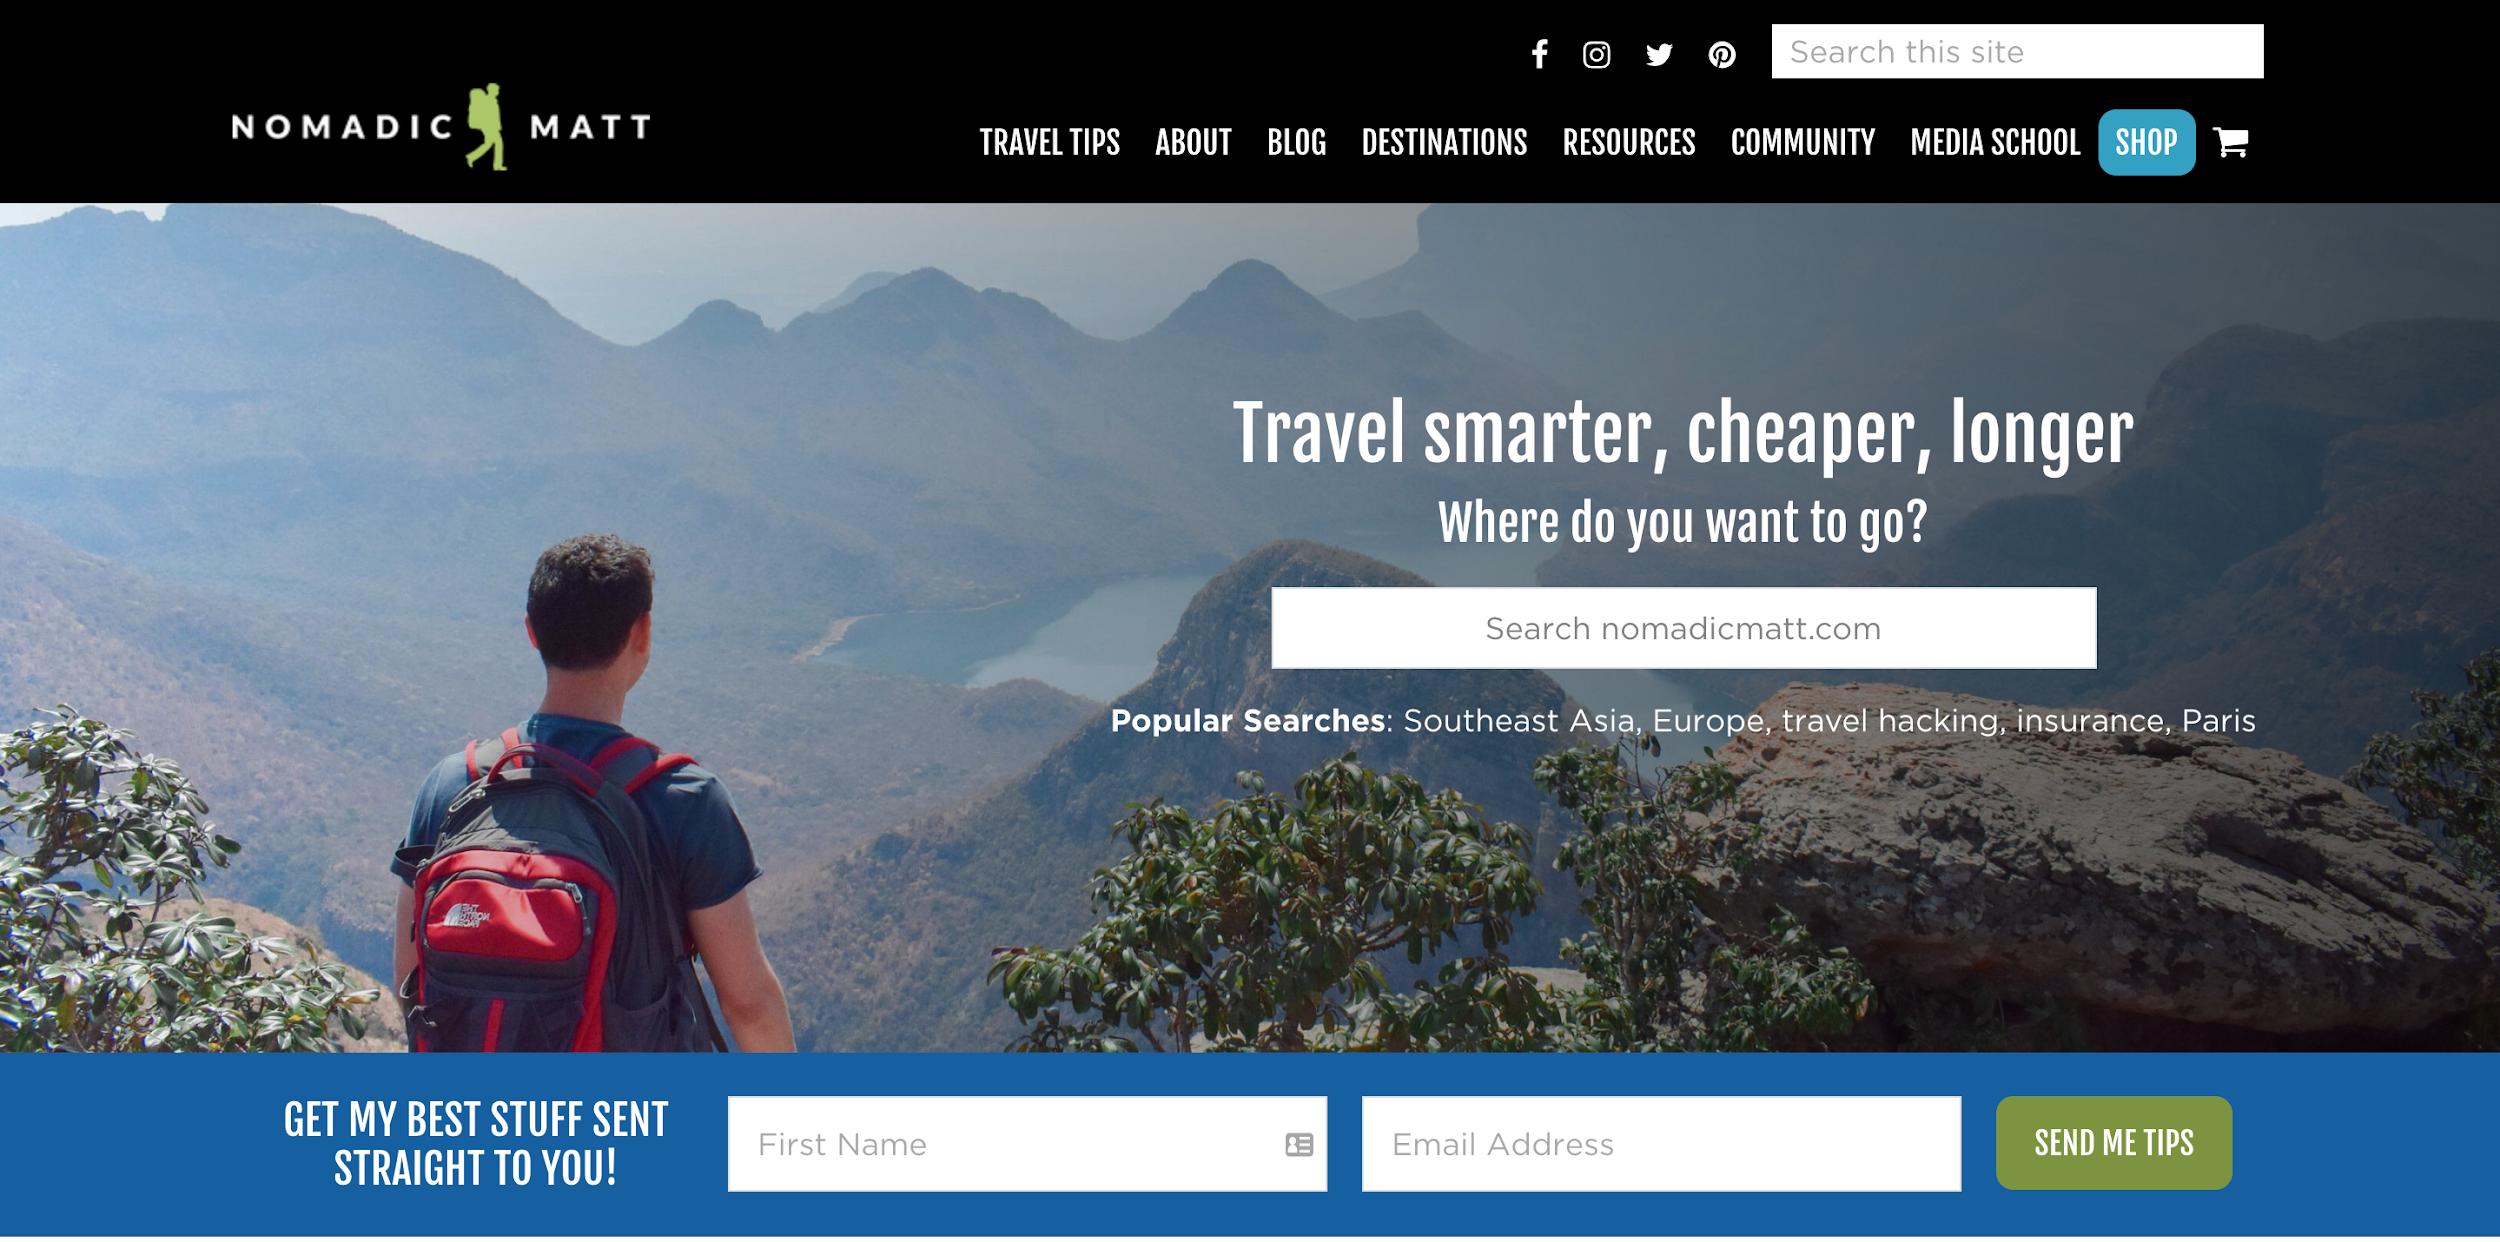 nomadic matt blog